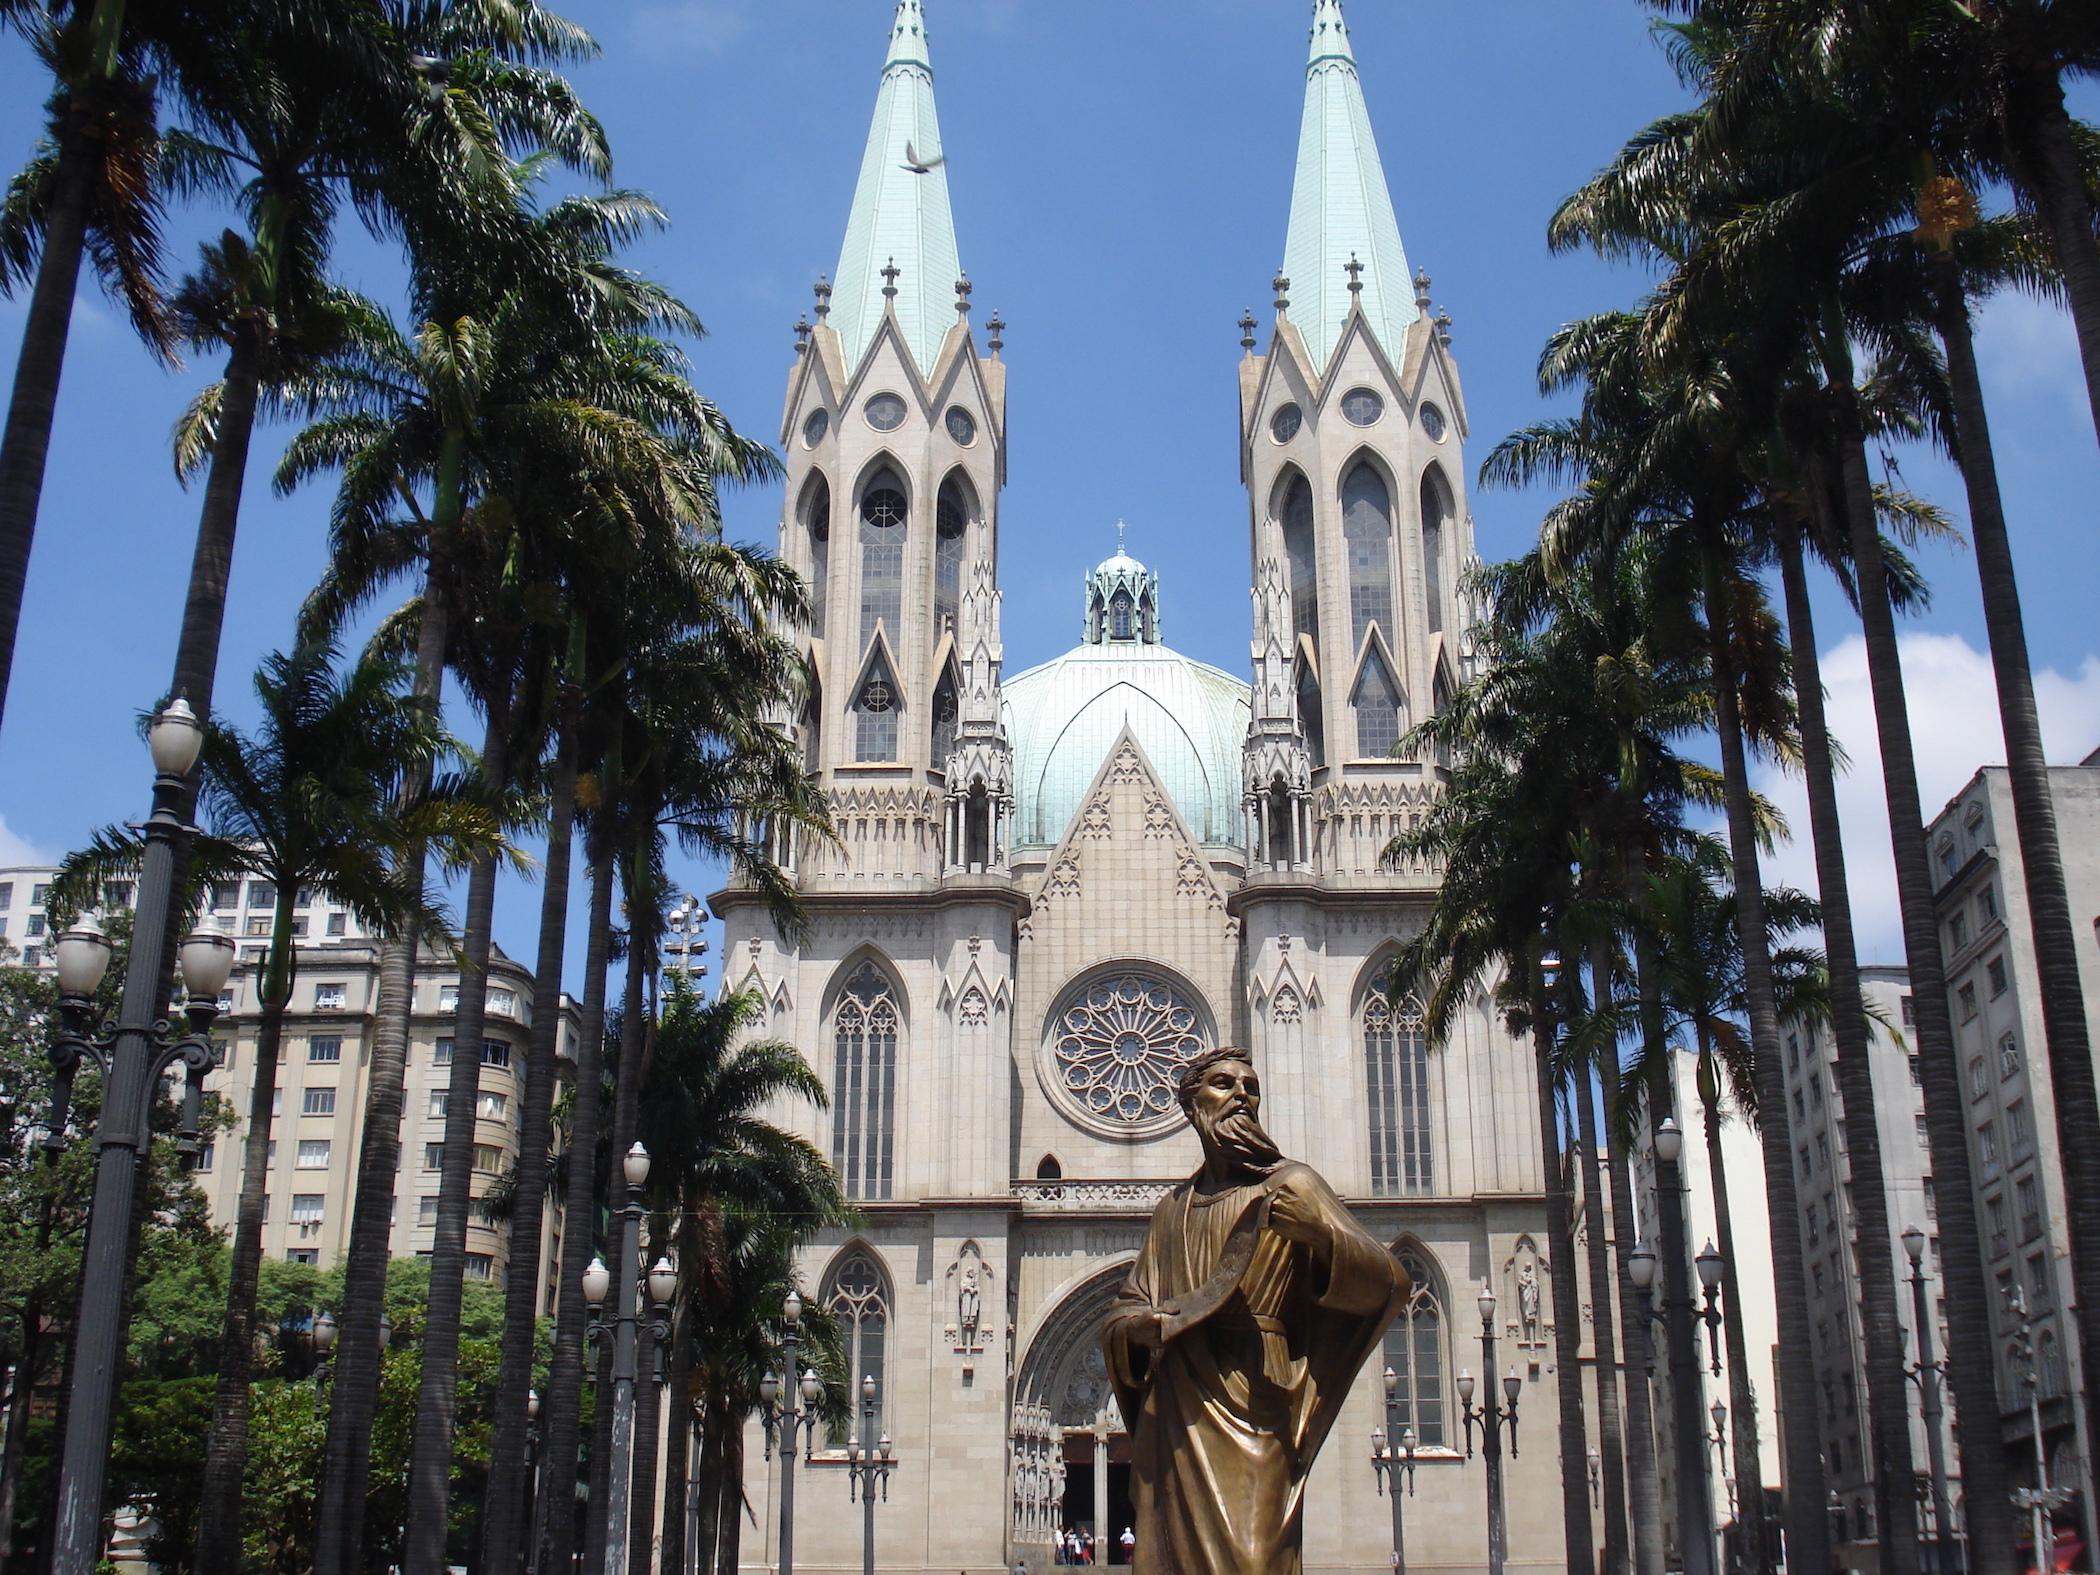 se-cathedral-sp-photo-victoria-hoch-flickr